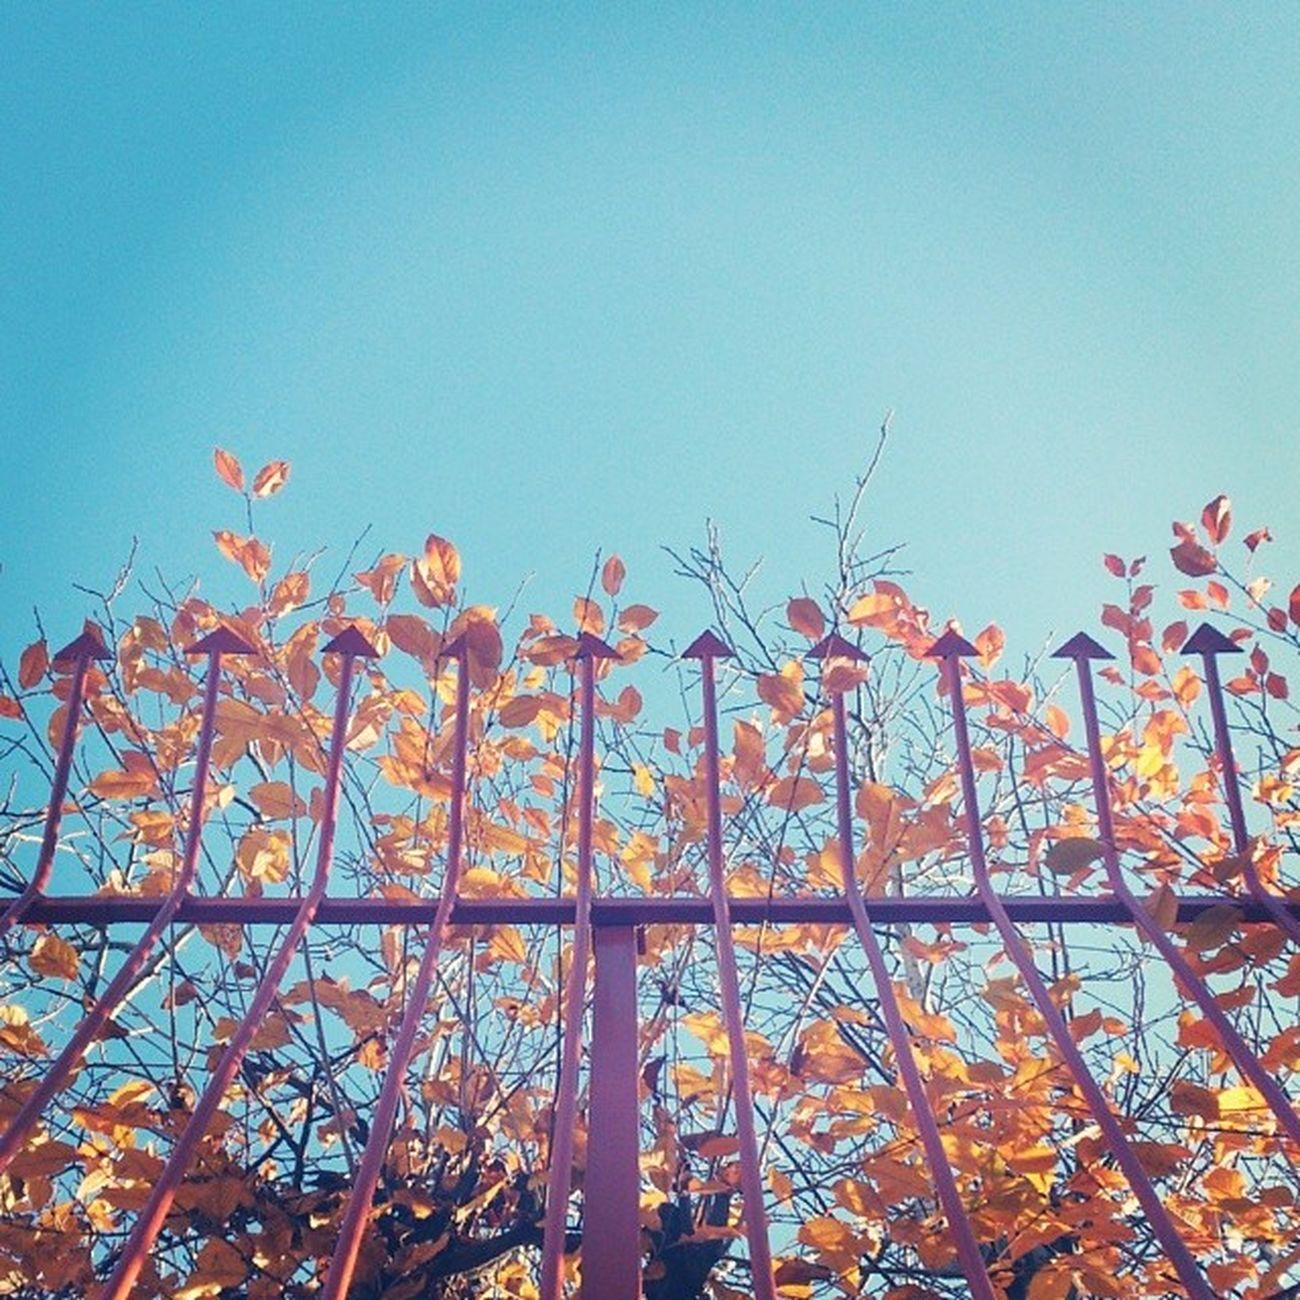 Iran Hamedan Sky Fall Atumn Trees Branches Fence Leafsپاییز برگ شاخه درخت حصار آسمان